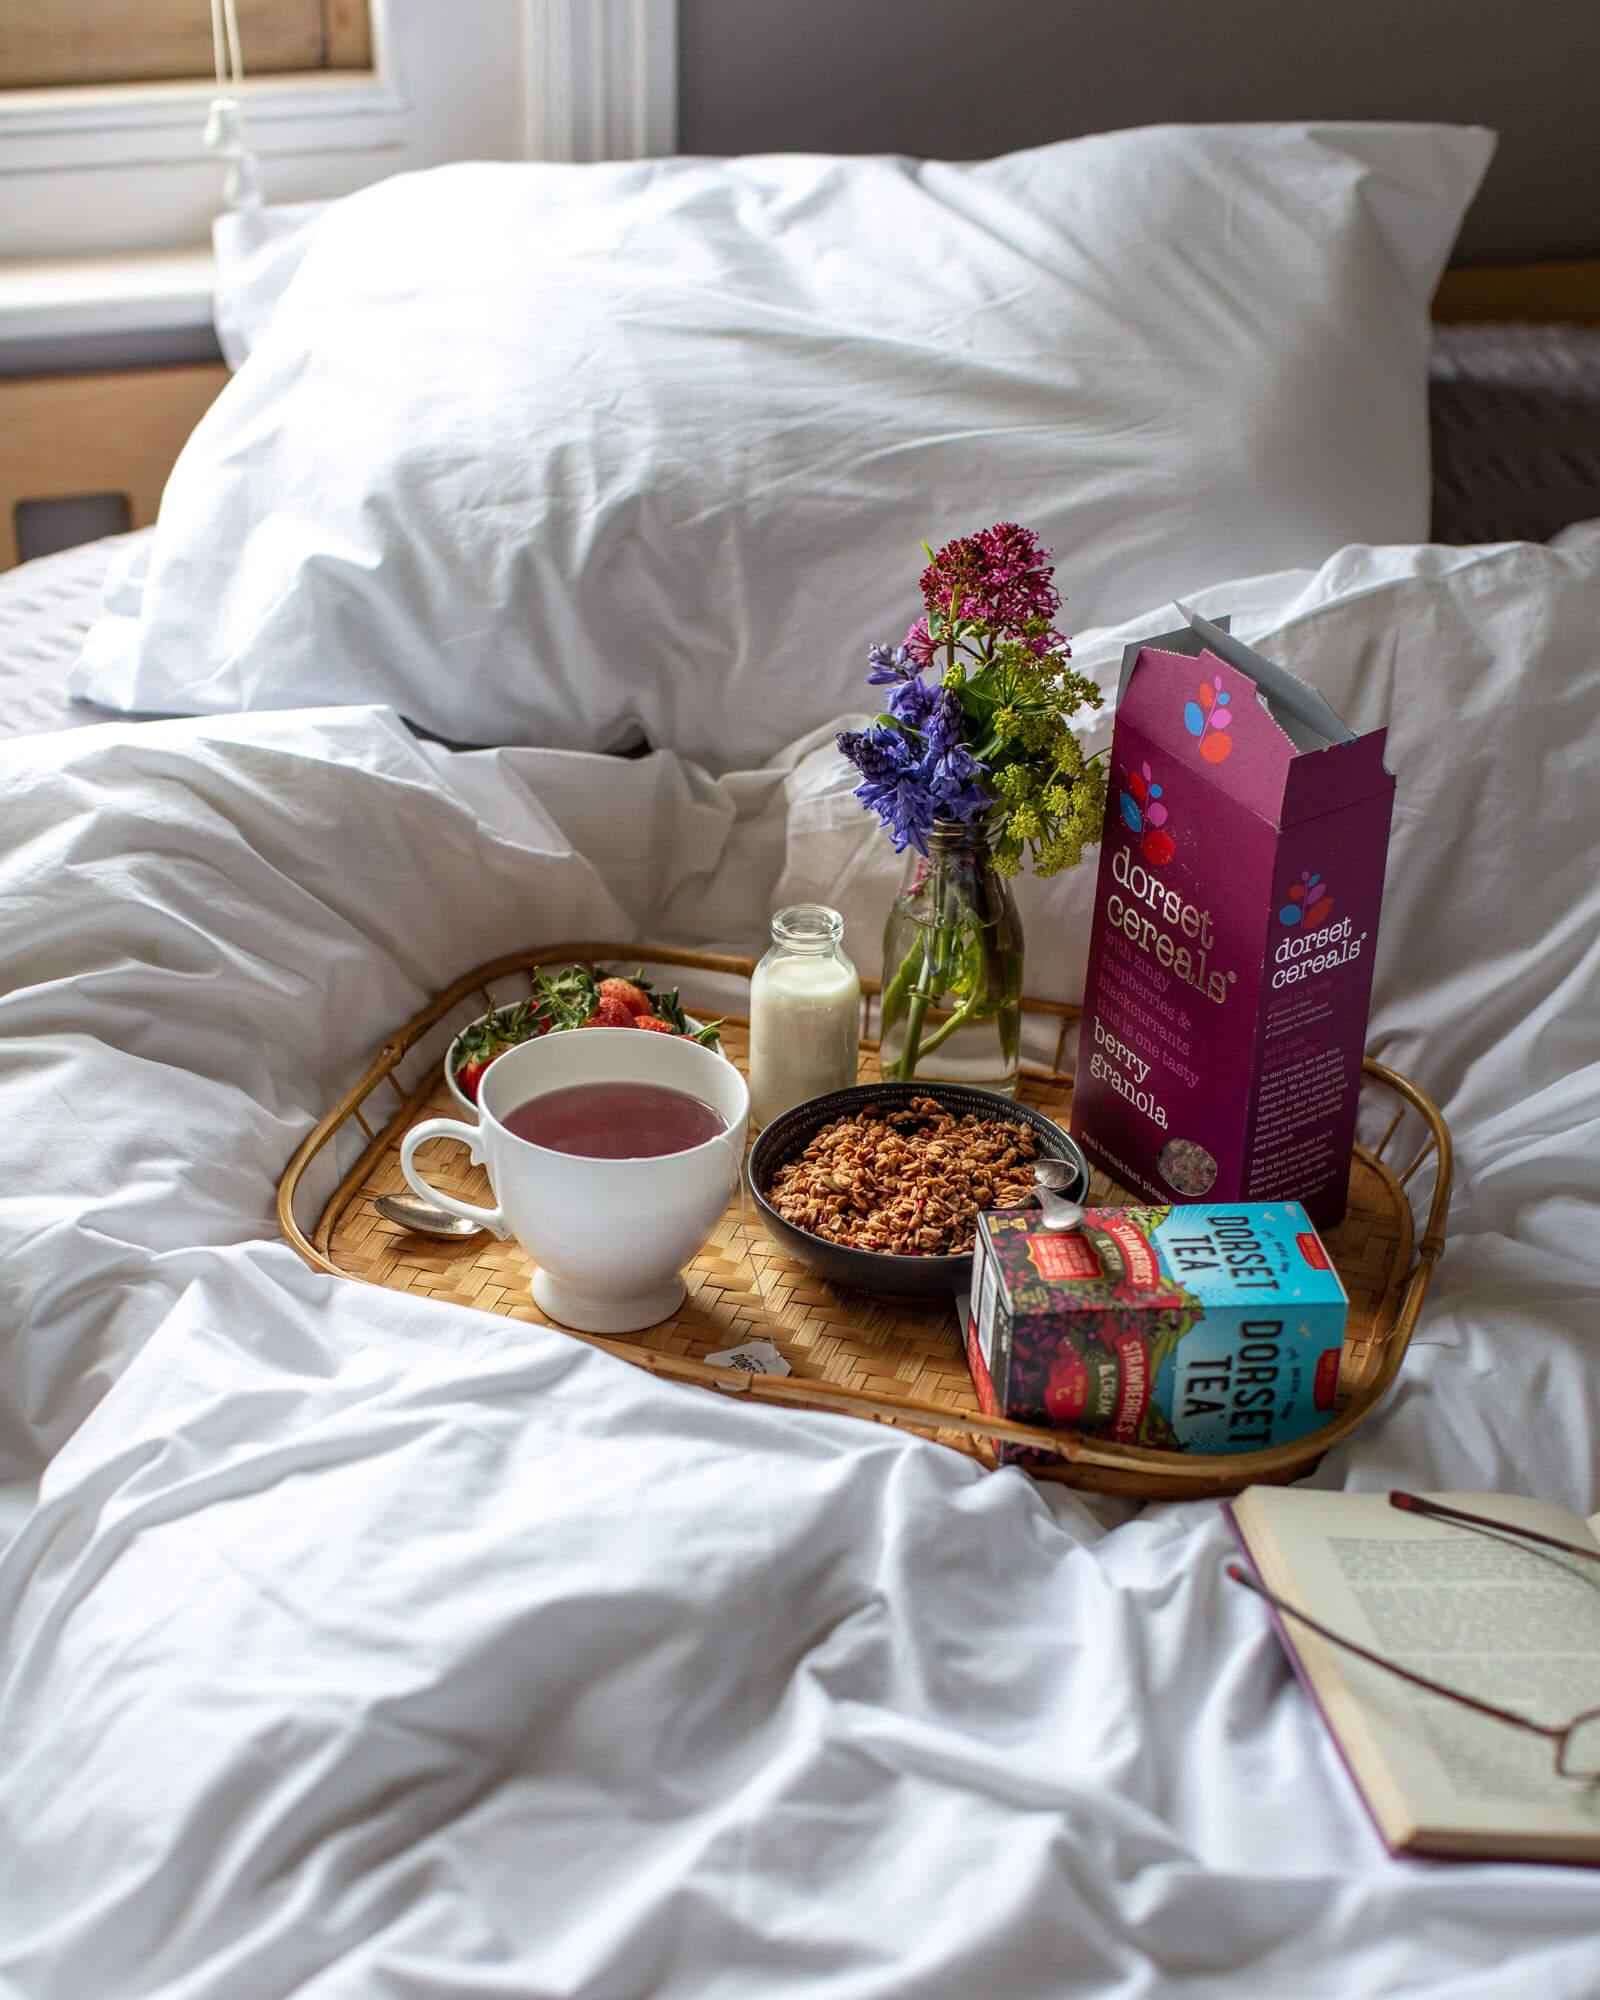 Dorset Tea- Food photography-Lara Jane Thorpe